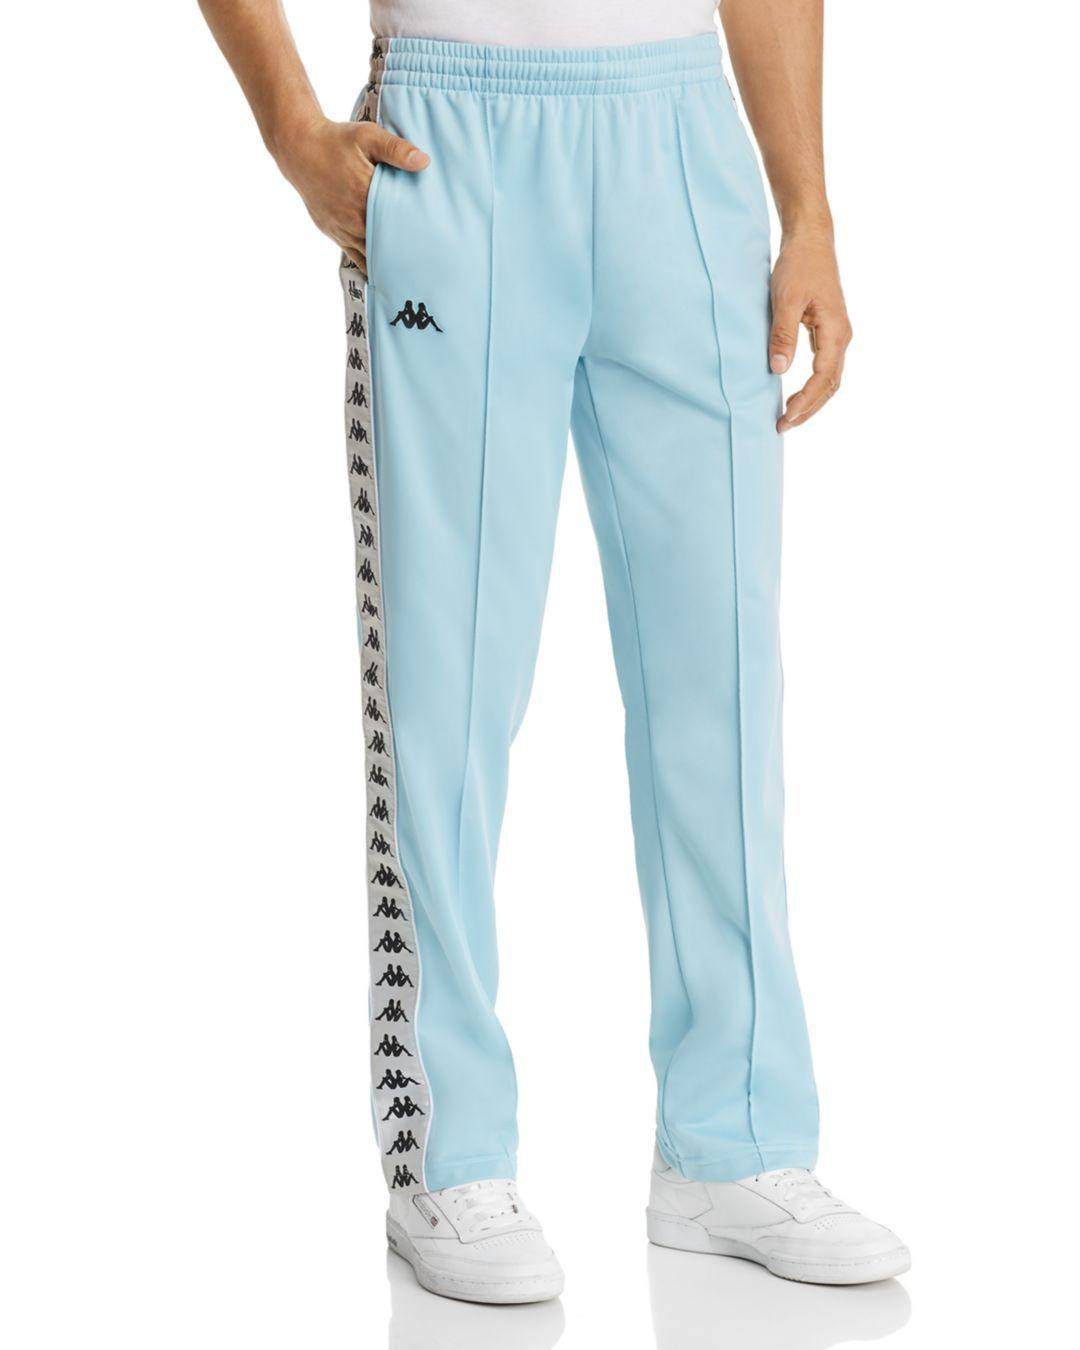 47c1c8bd3a Kappa Banda Astoriazz Track Pants in Blue for Men - Lyst